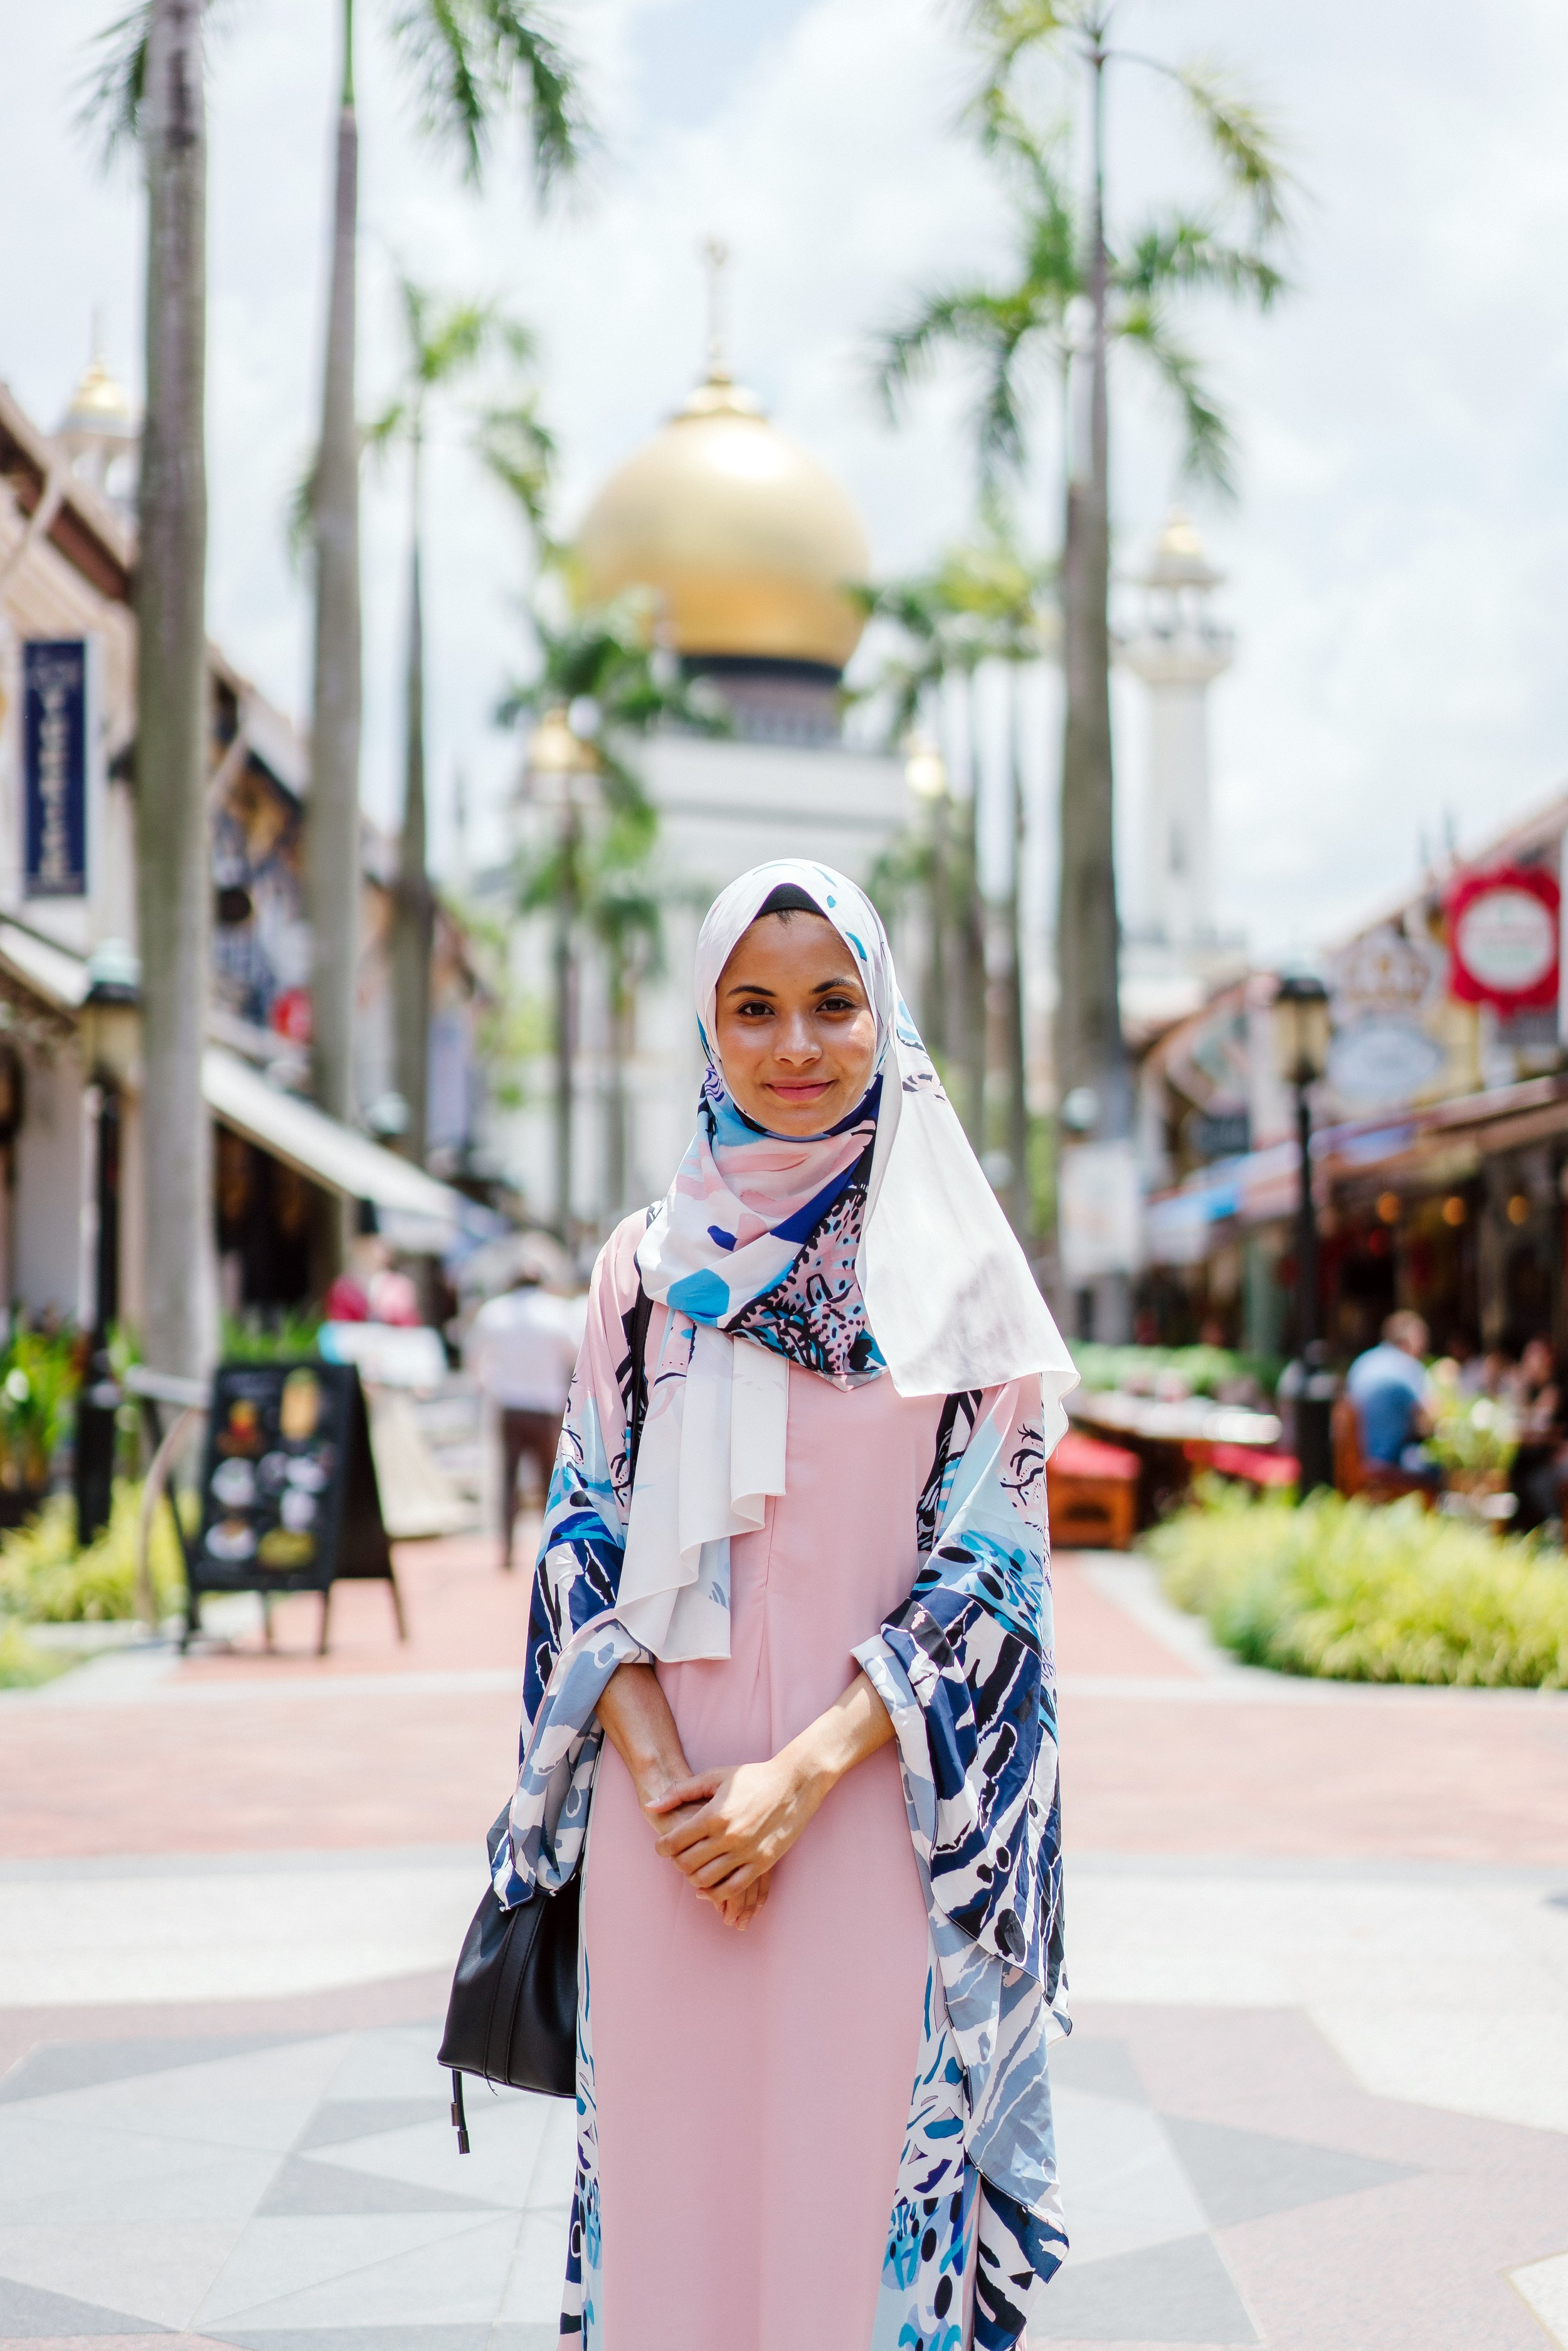 dress-female-headscarf-1162890.jpg